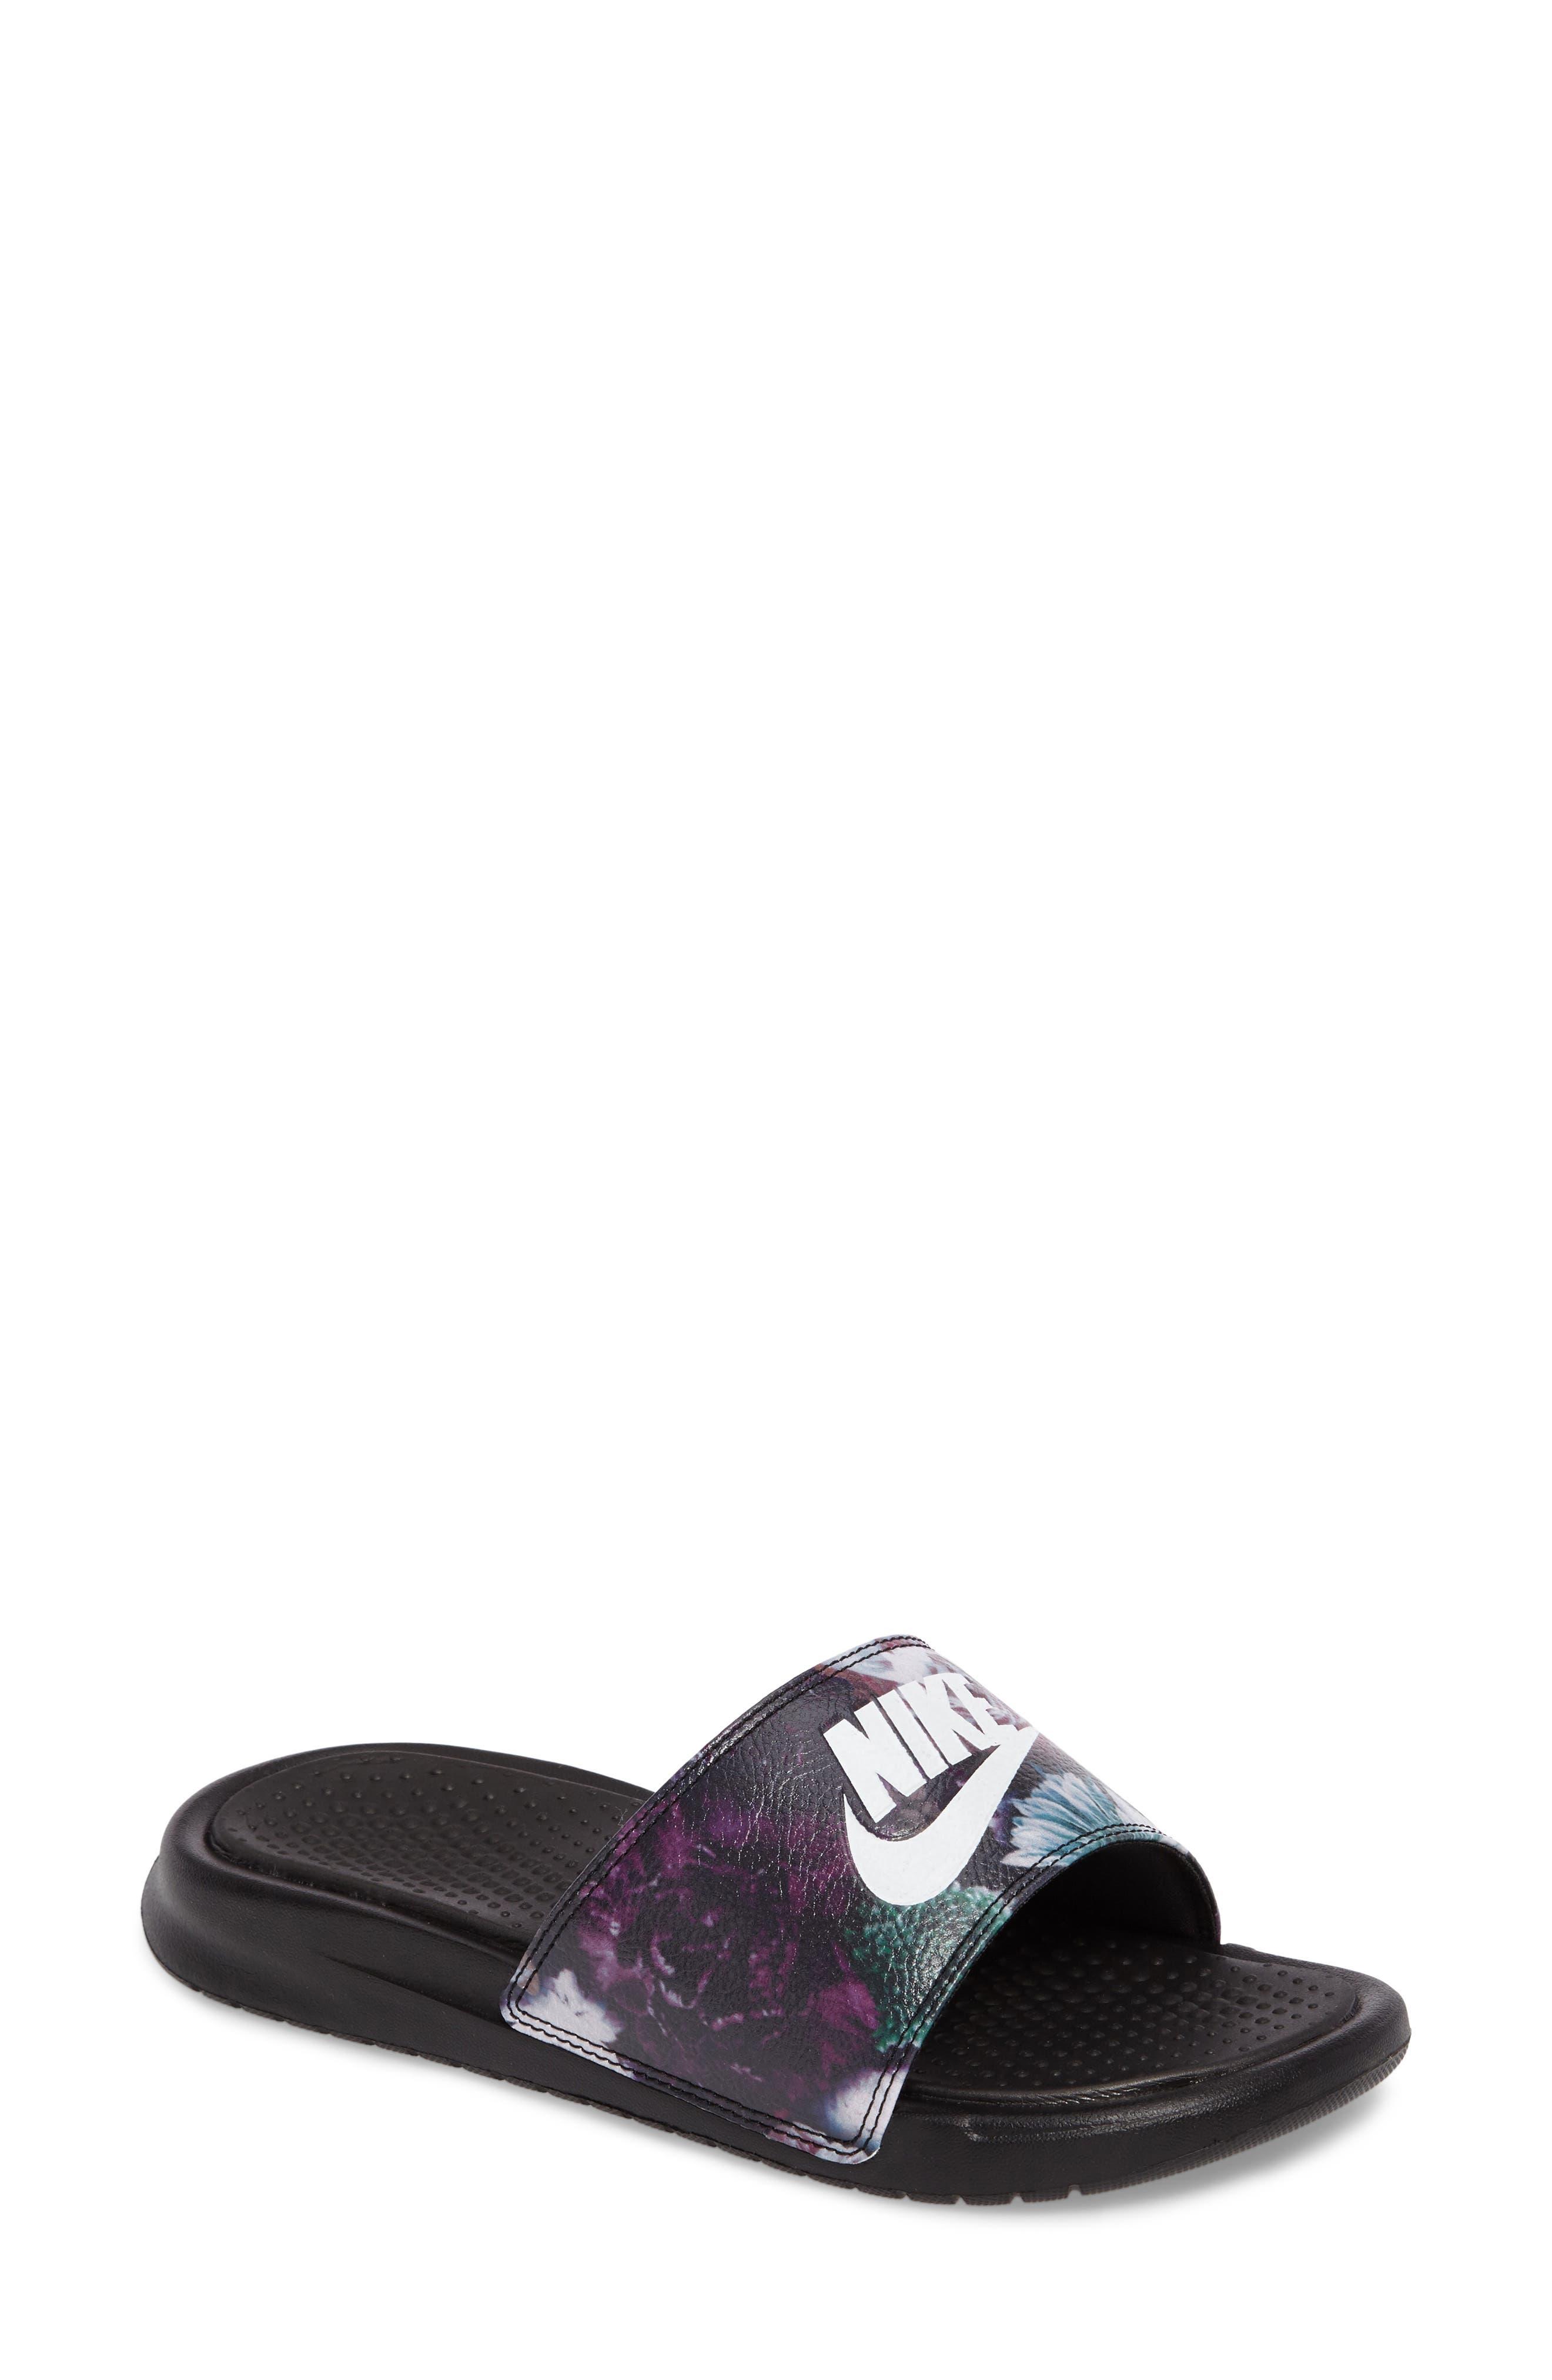 Alternate Image 1 Selected - Nike 'Benassi Just Do It Ultra Premium' Slide Sandal (Women)